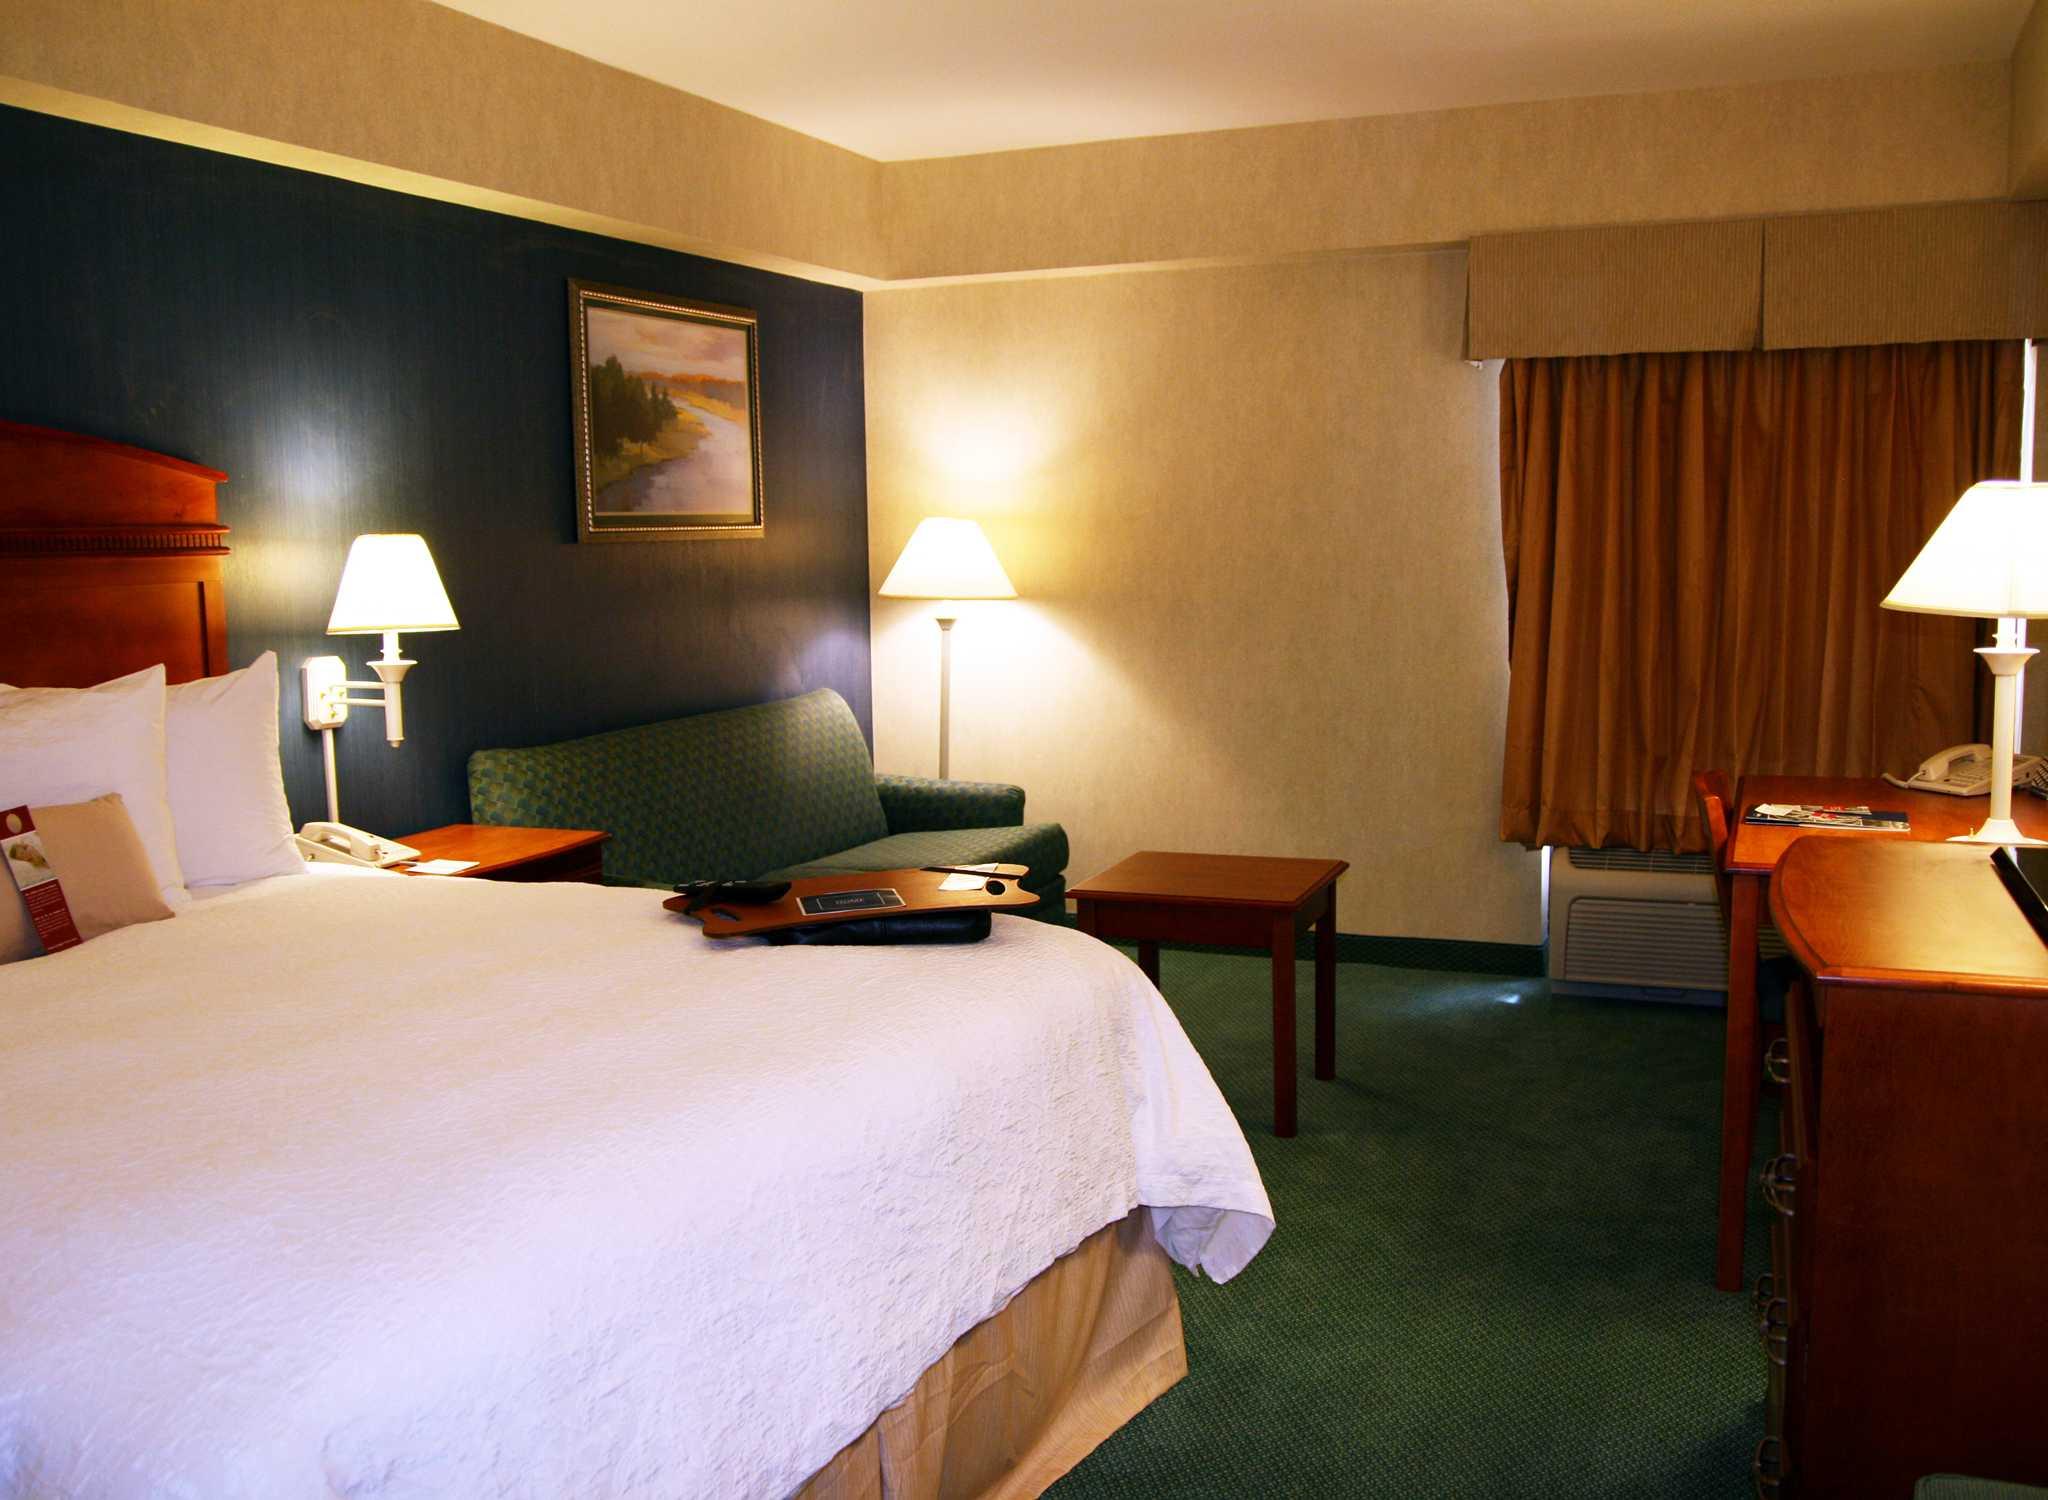 Chihuahua Hotels | Hampton Inn by Hilton Chihuahua City, Mexico